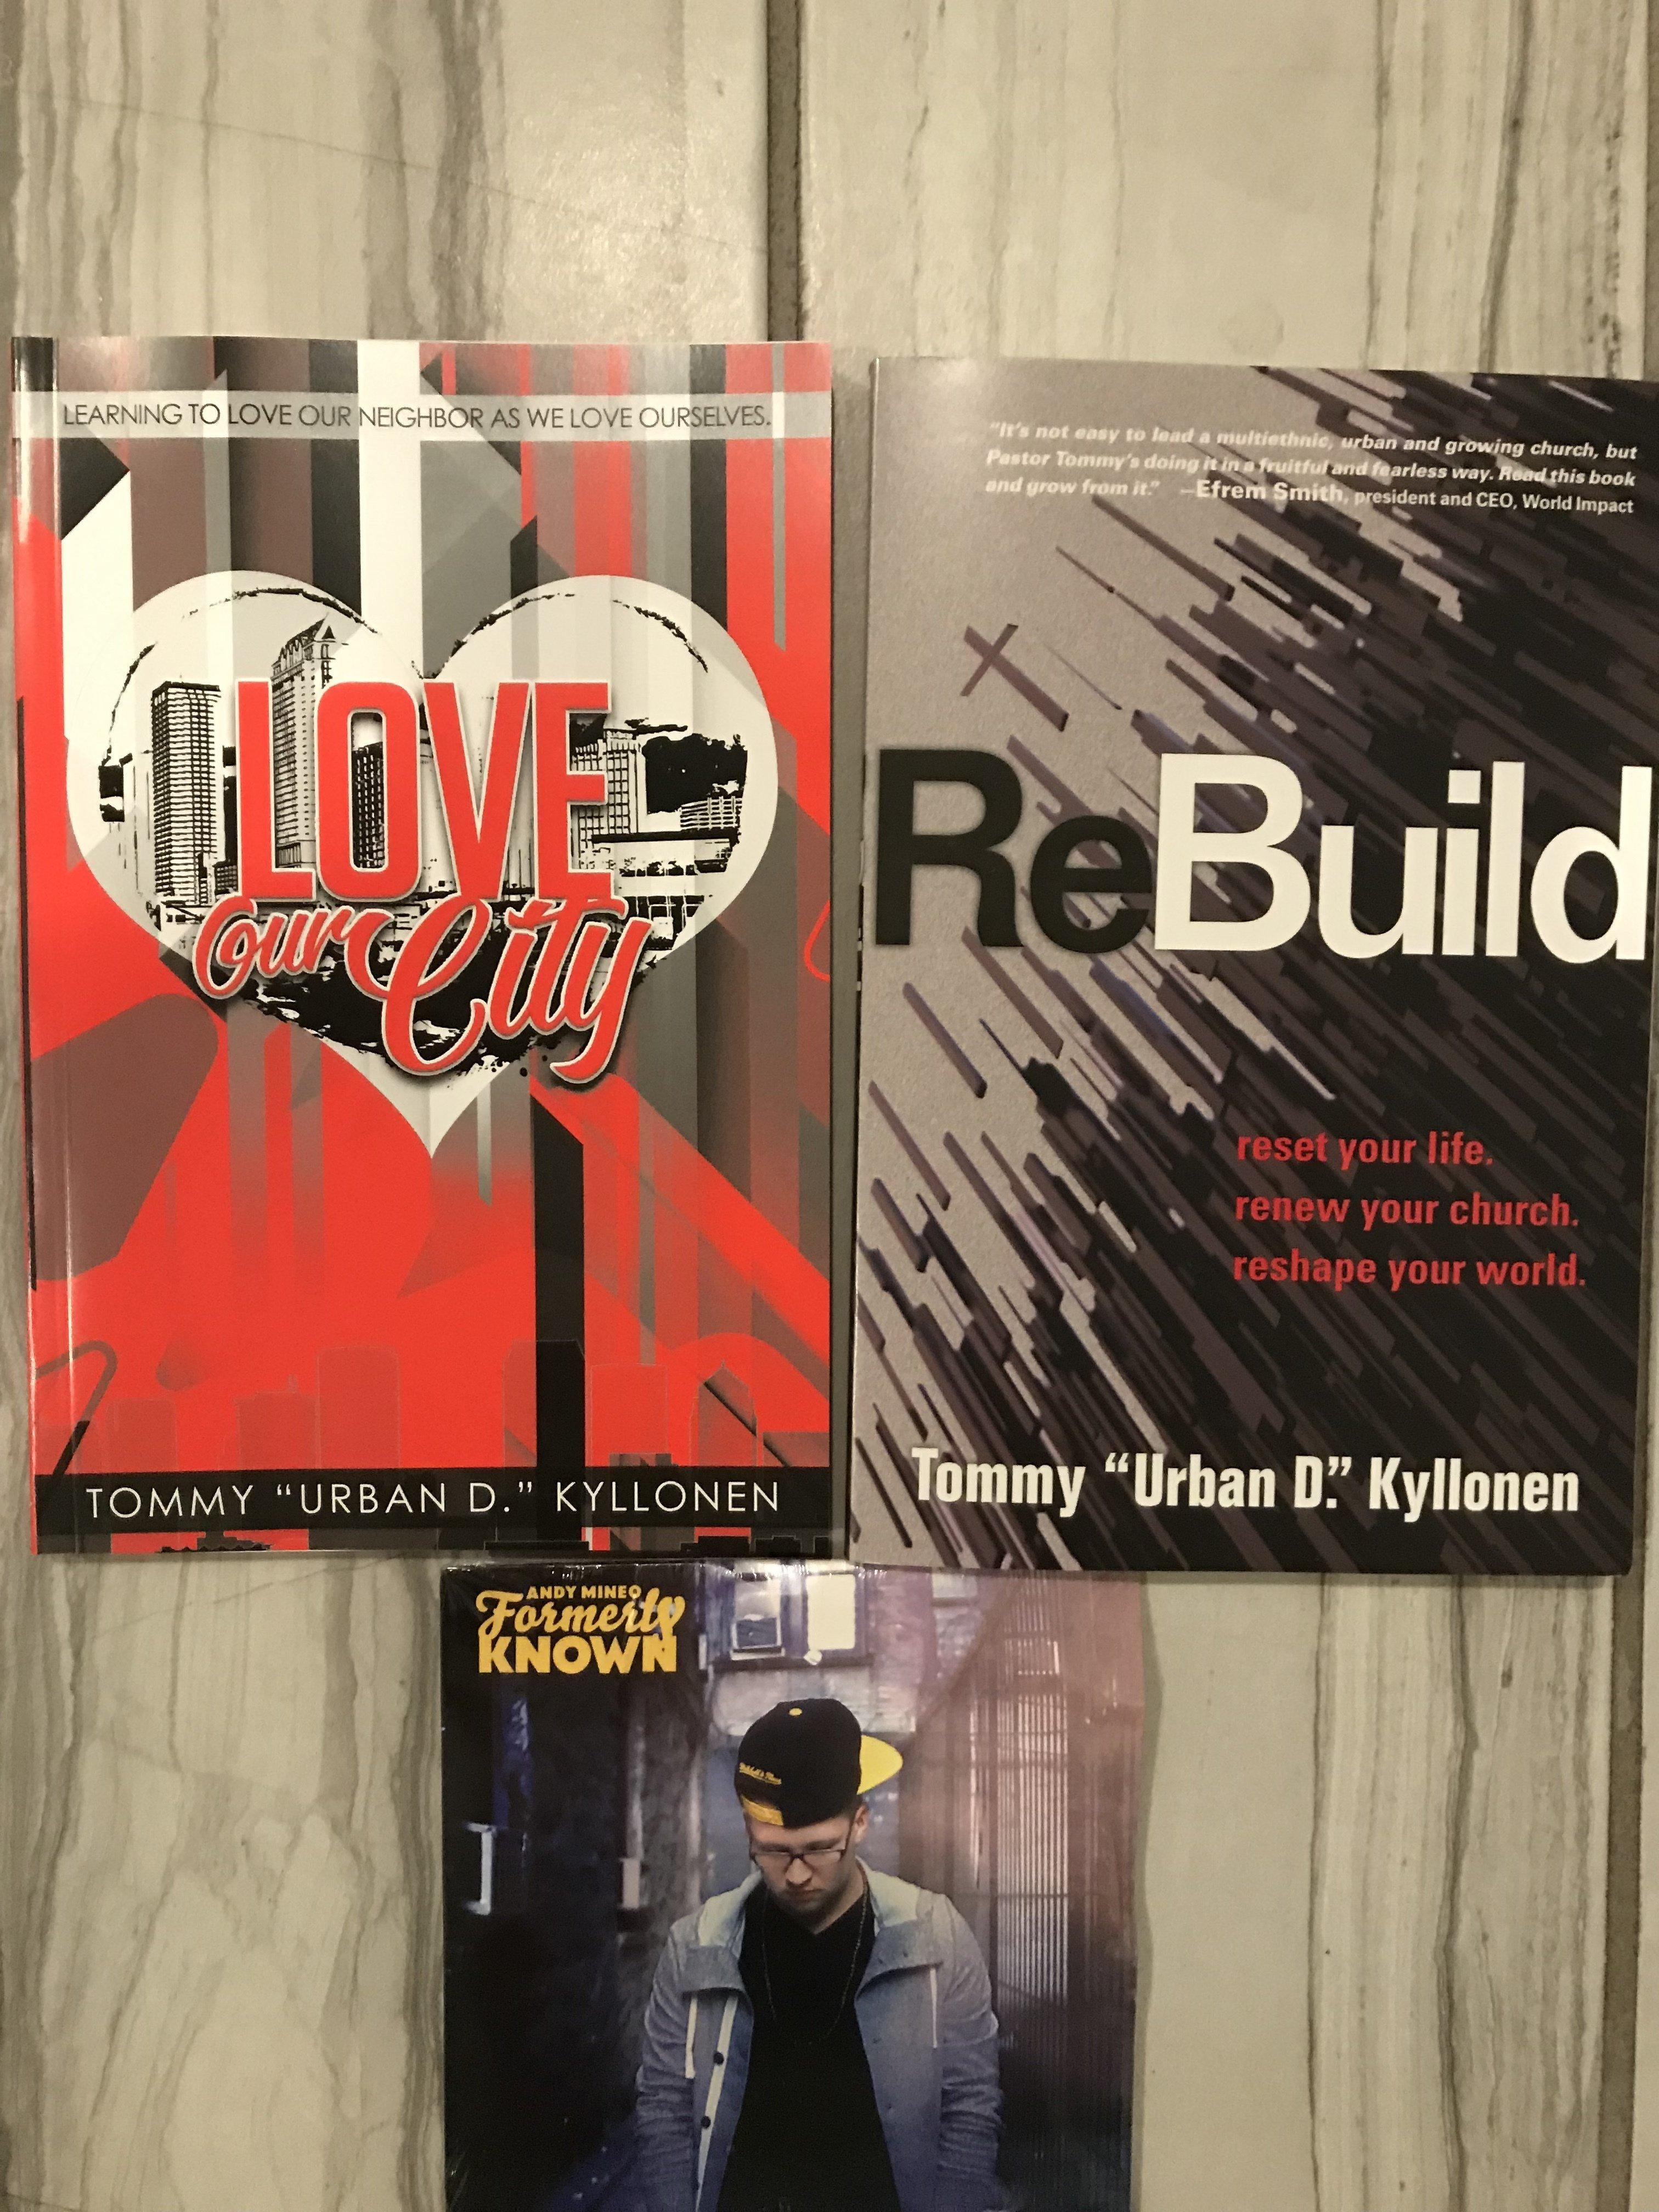 Love Our City, ReBuild & CD 20010